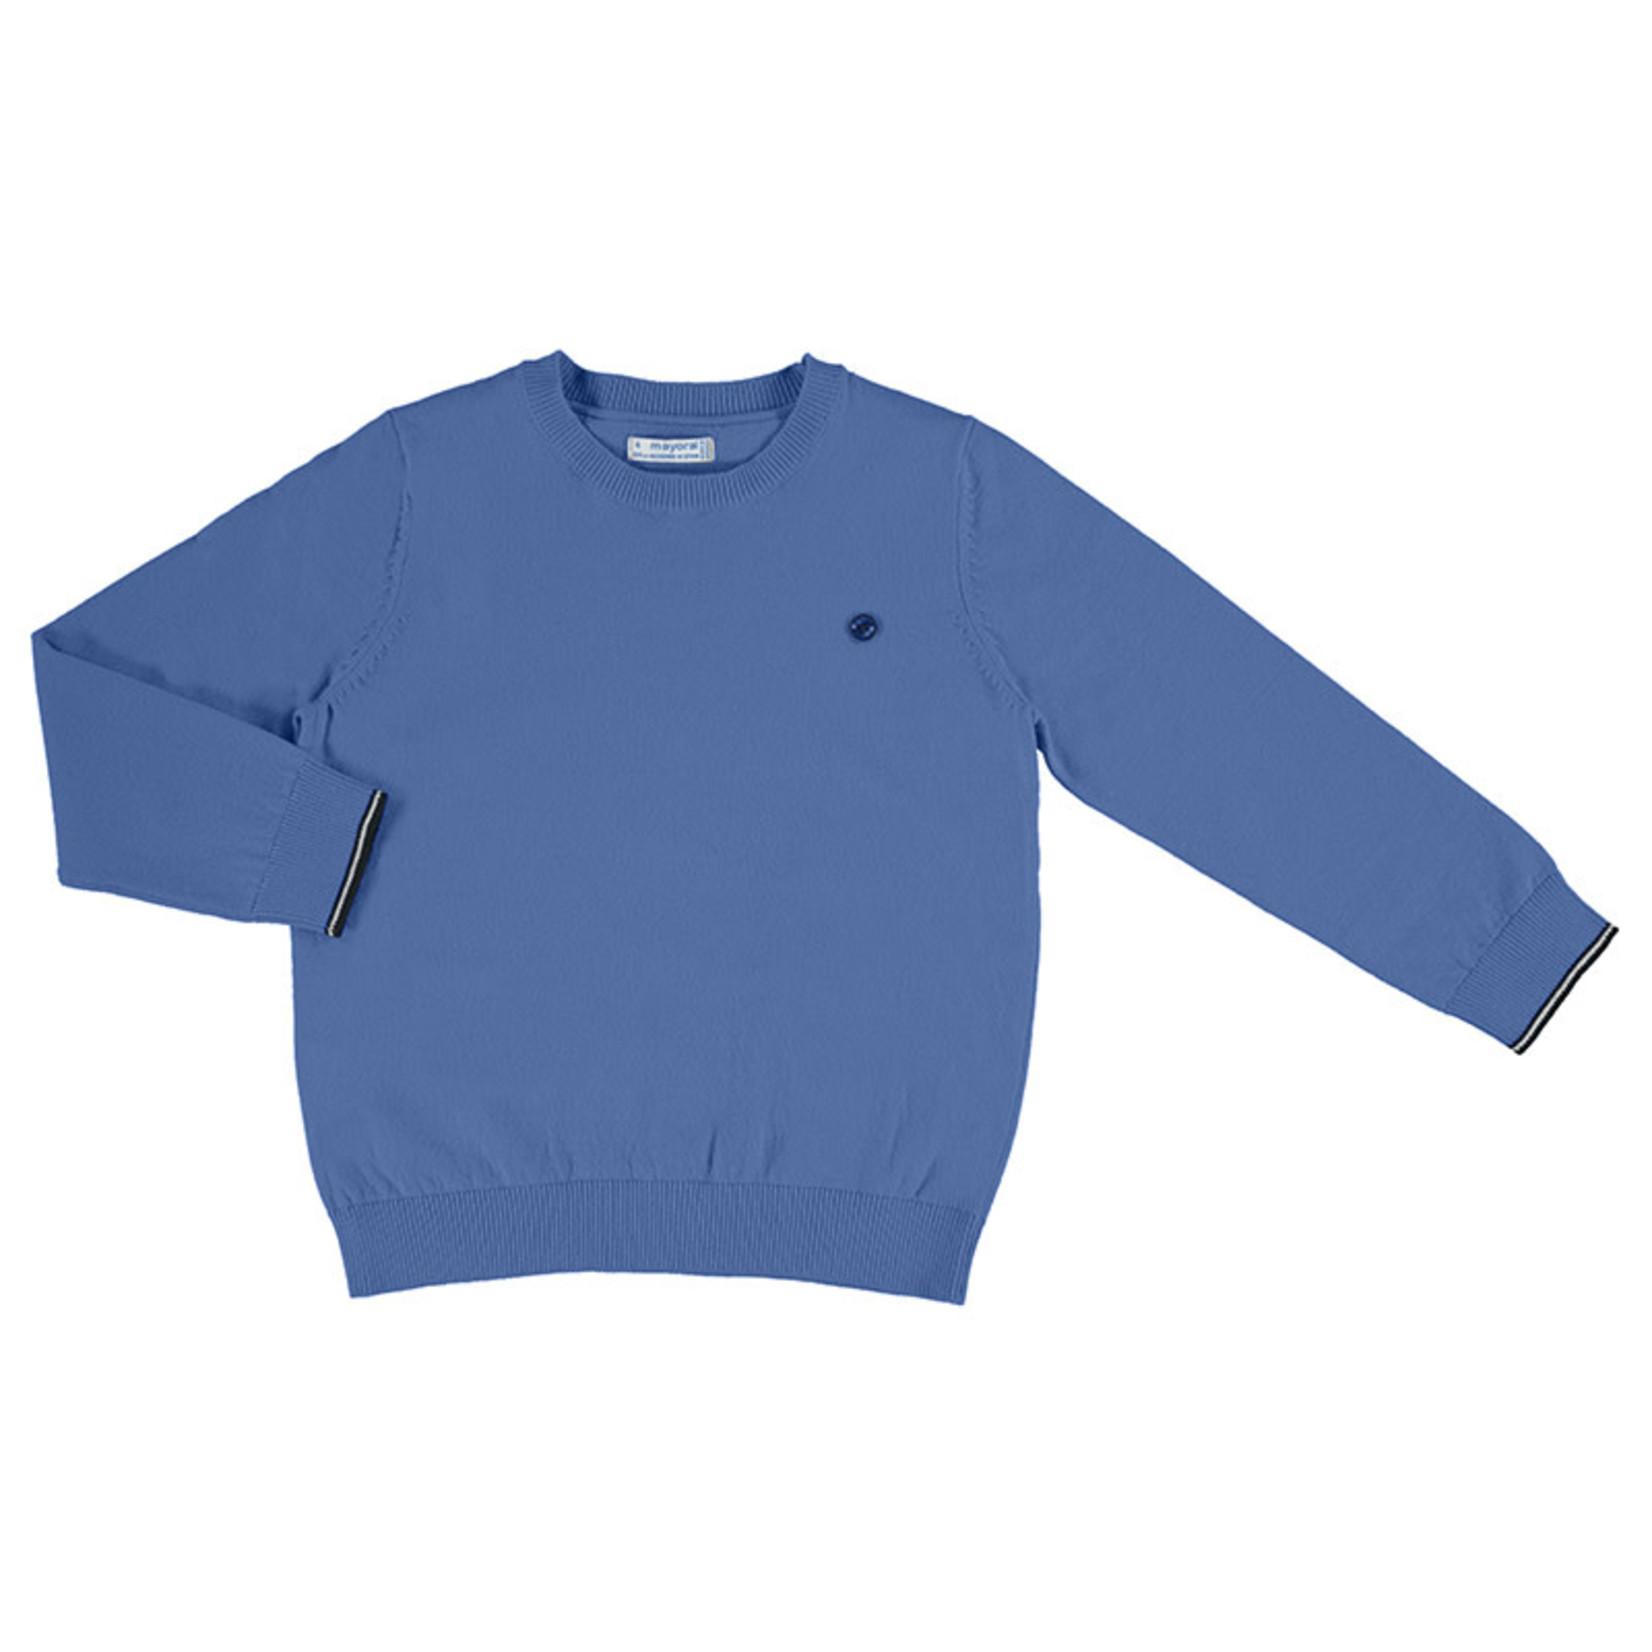 Mayoral Boys Crew Neck Sweater, Waves Blue